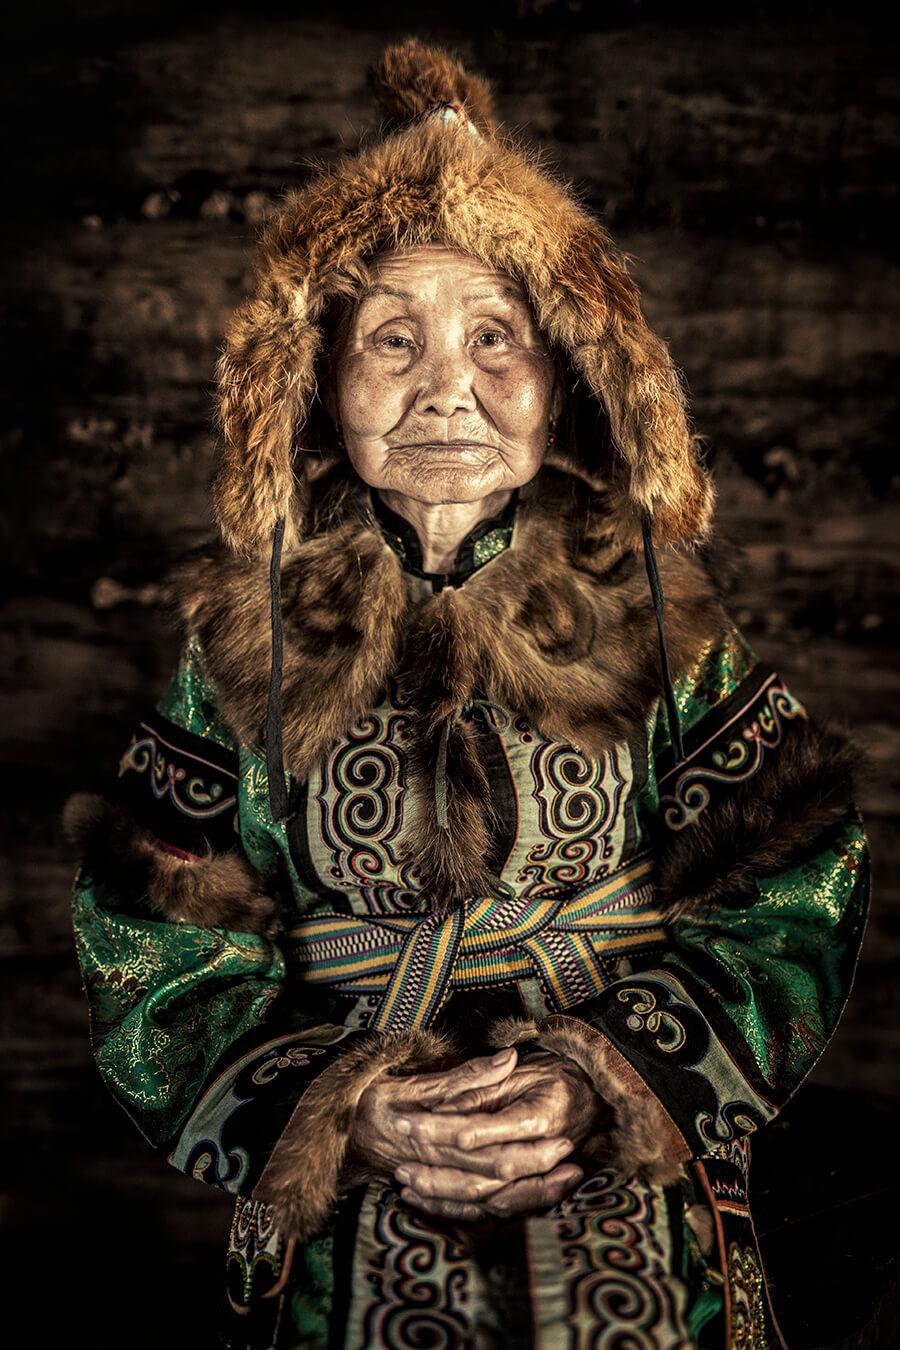 Бабушка - представительница коренного малочисленного народа ульчи. Хабаровский Край. © Александр Химушин / The World In Faces